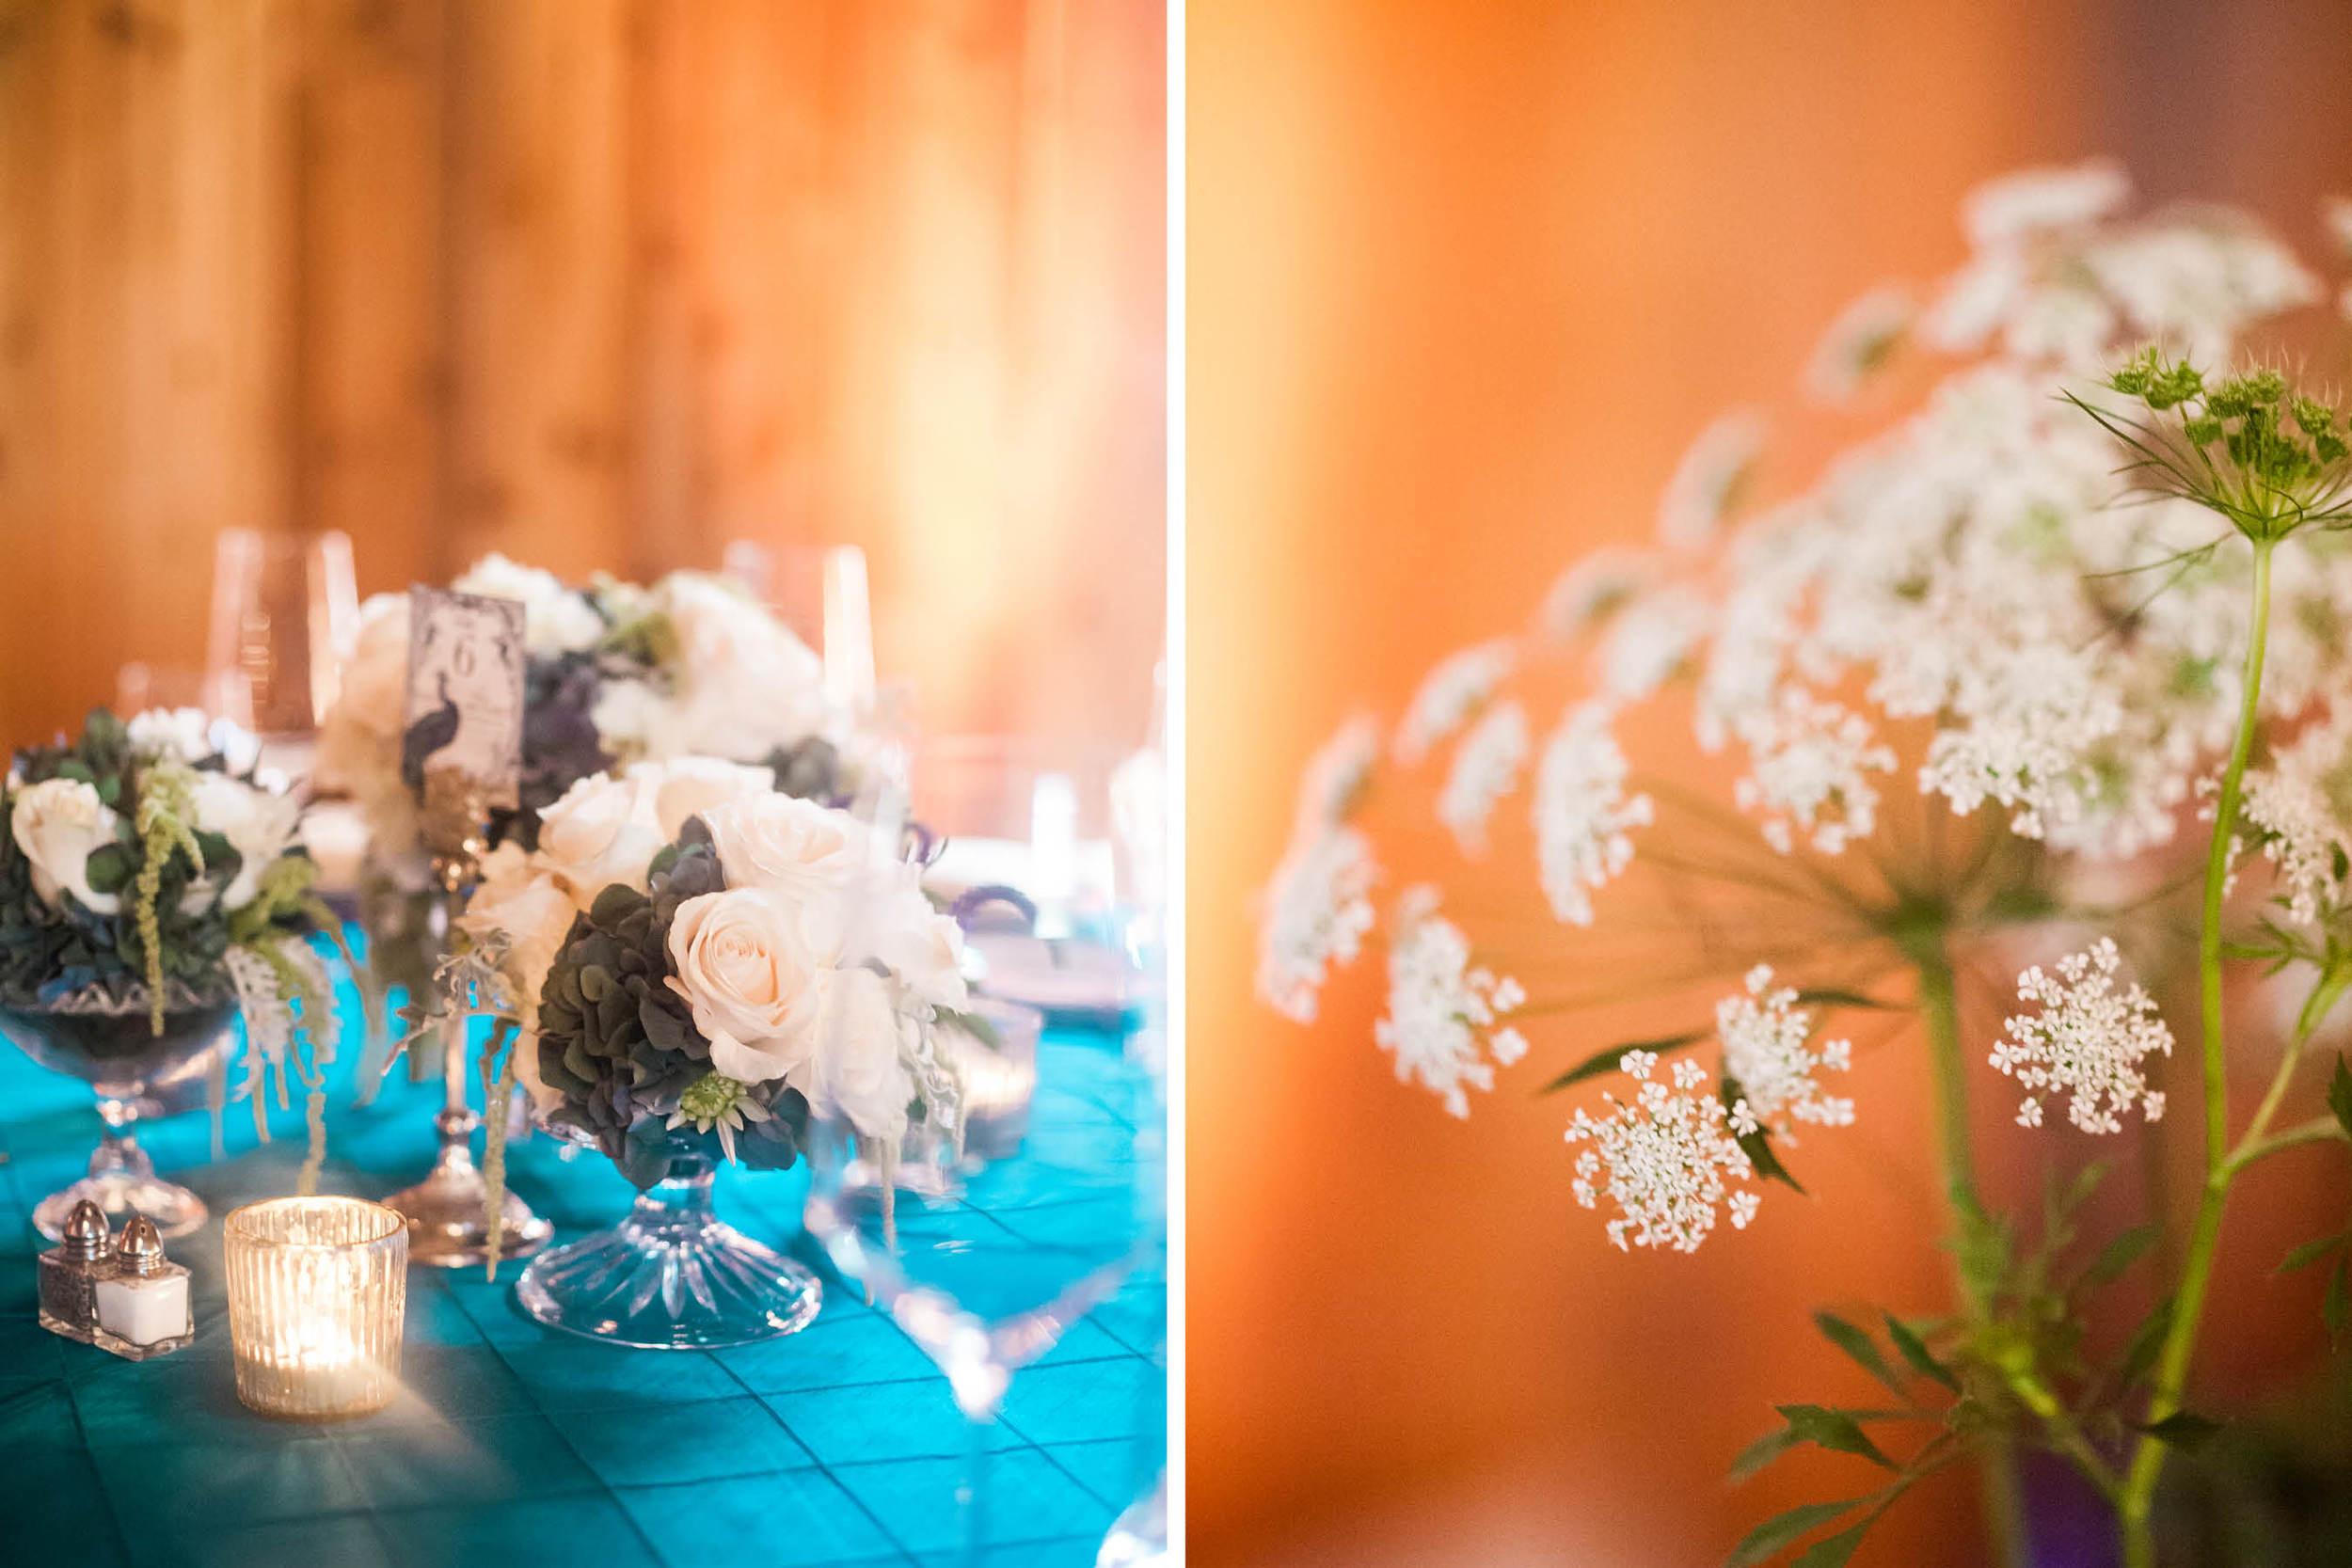 tres-hermanas-winery-vineyard-wedding-planner-coordinator-santa-barbara-ynez-maria (18).jpg